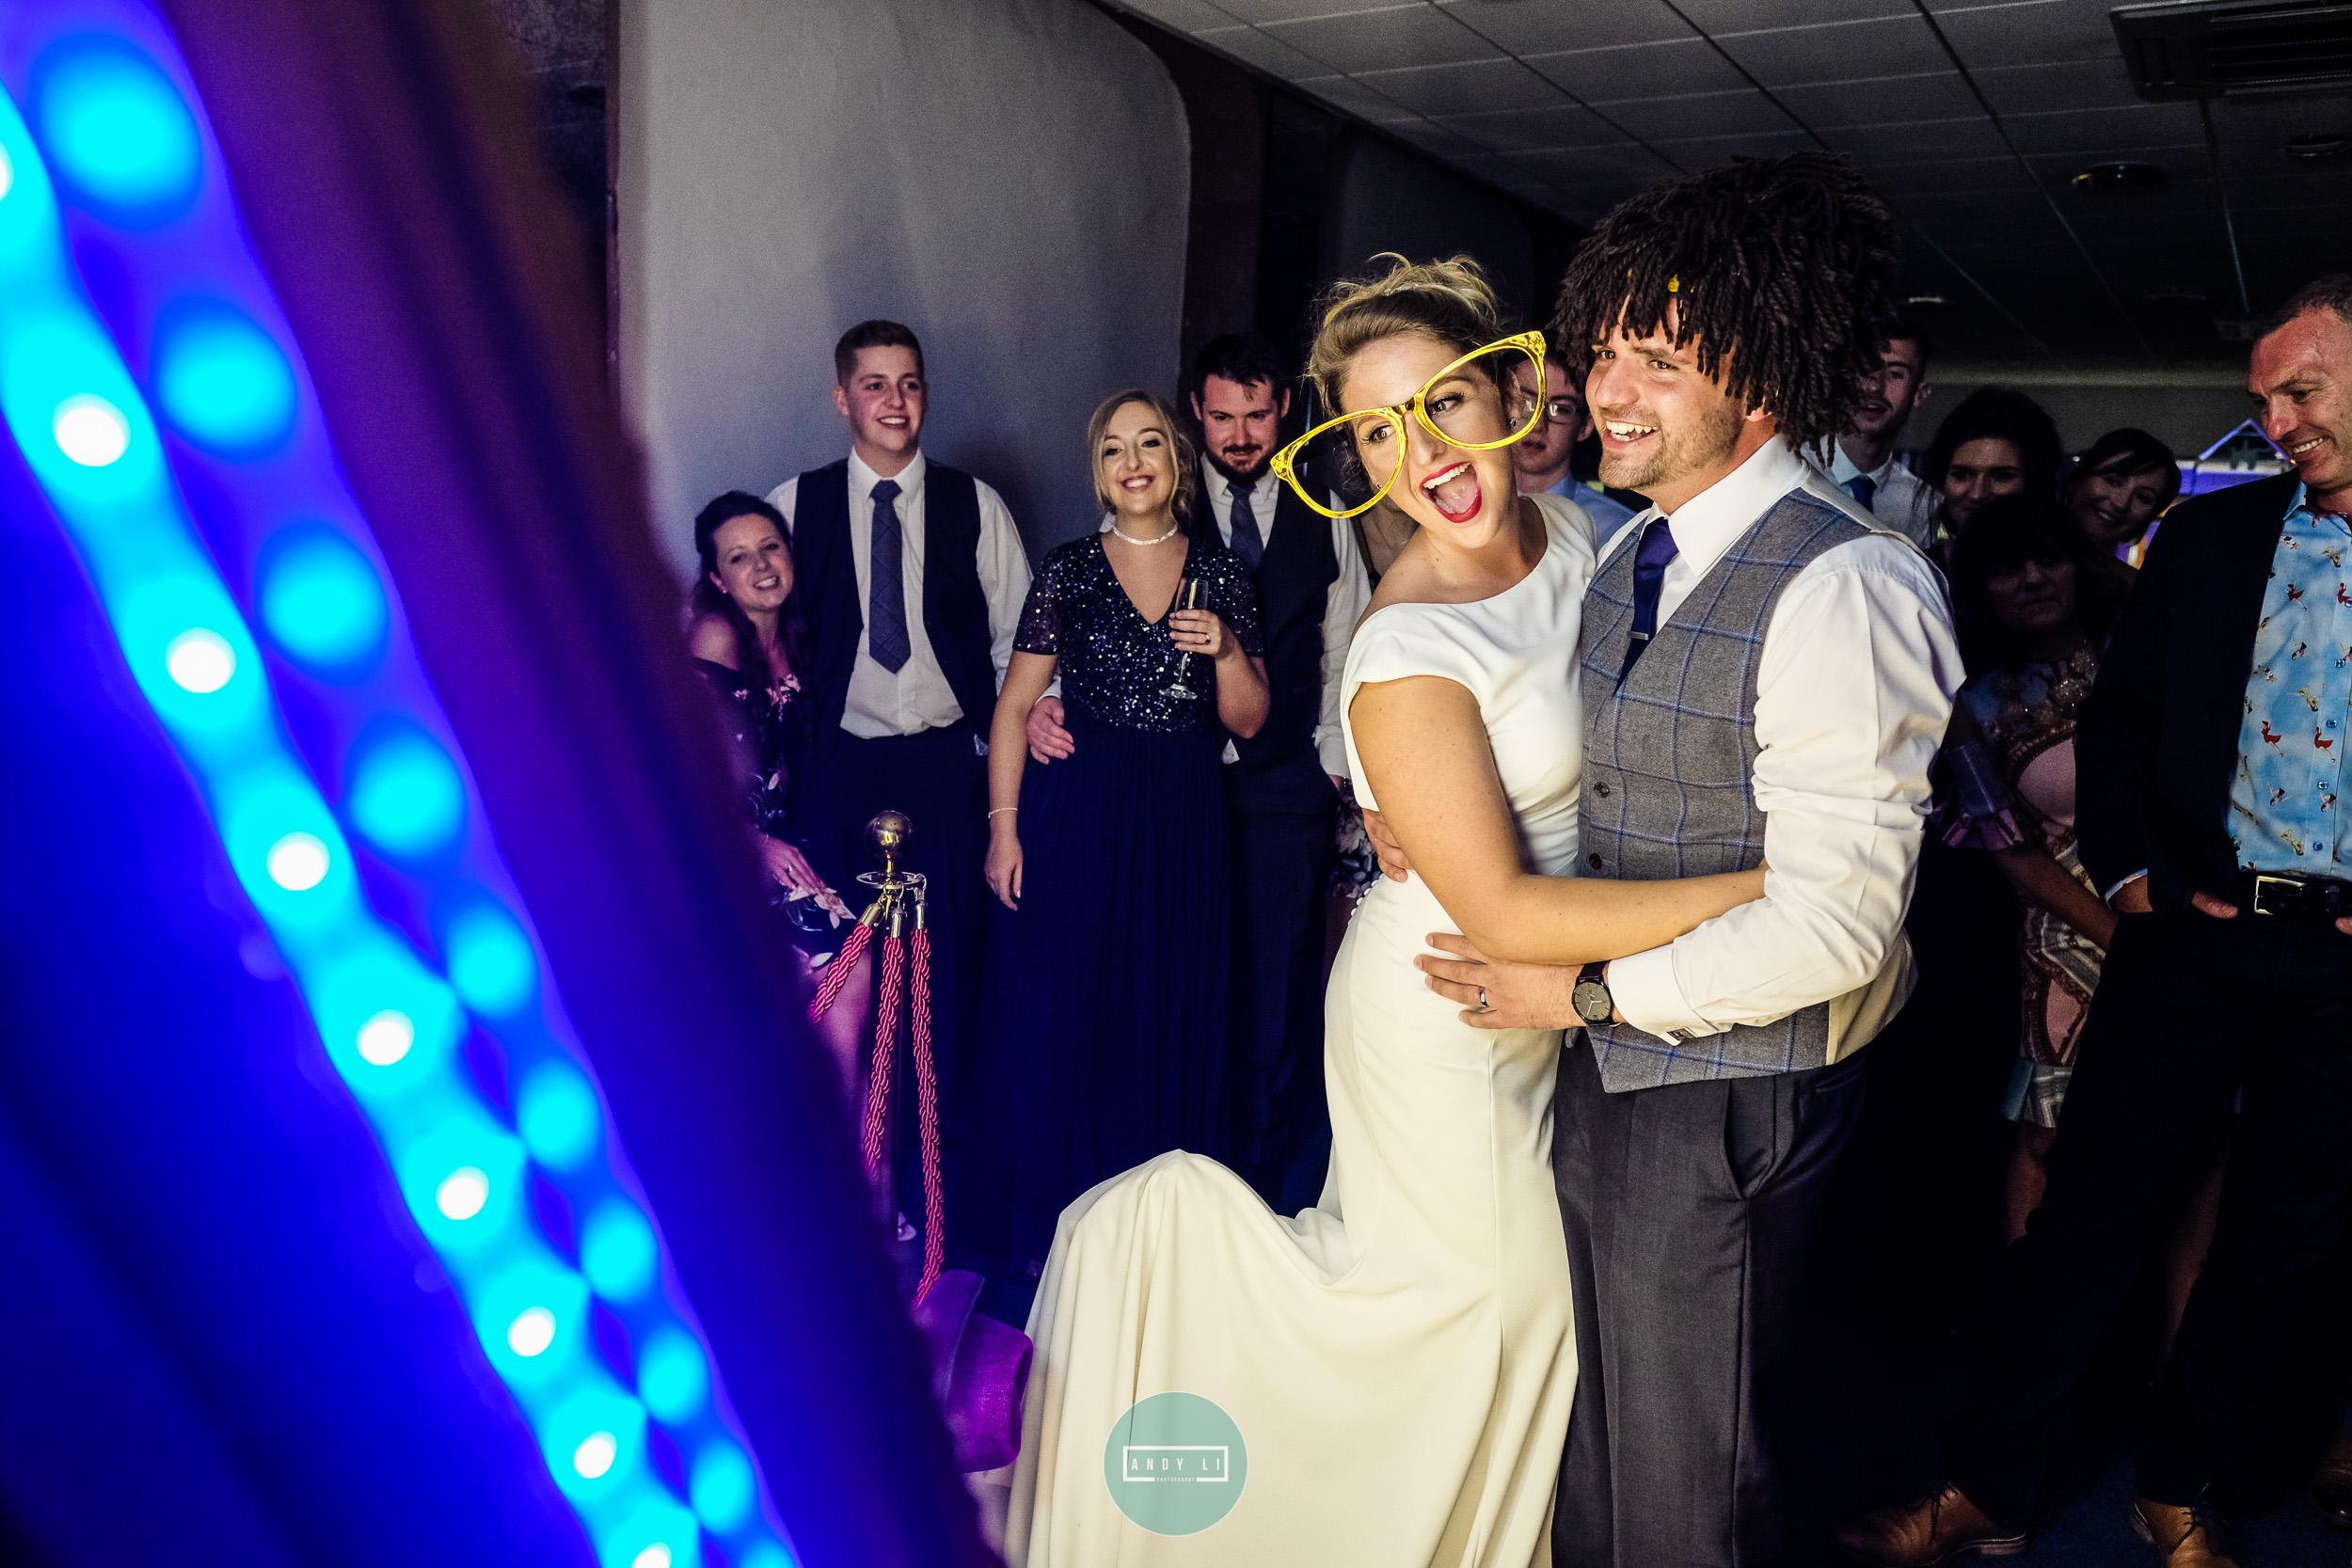 Lilleshall Hall Wedding Photographer-075-XPRO1825.jpg